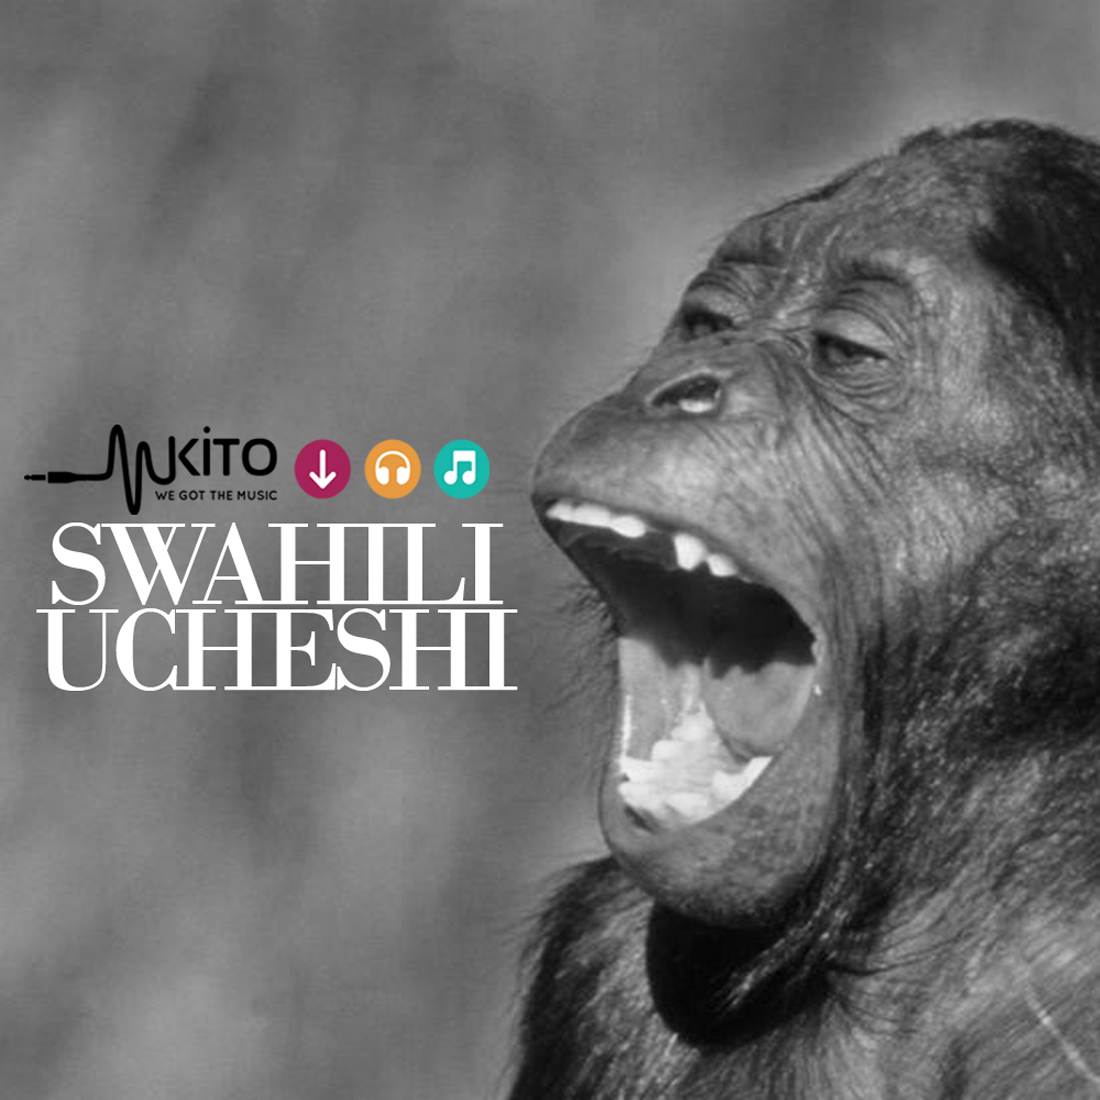 Swahili Ucheshi - BashiriCheti_SwahiliUcheshi